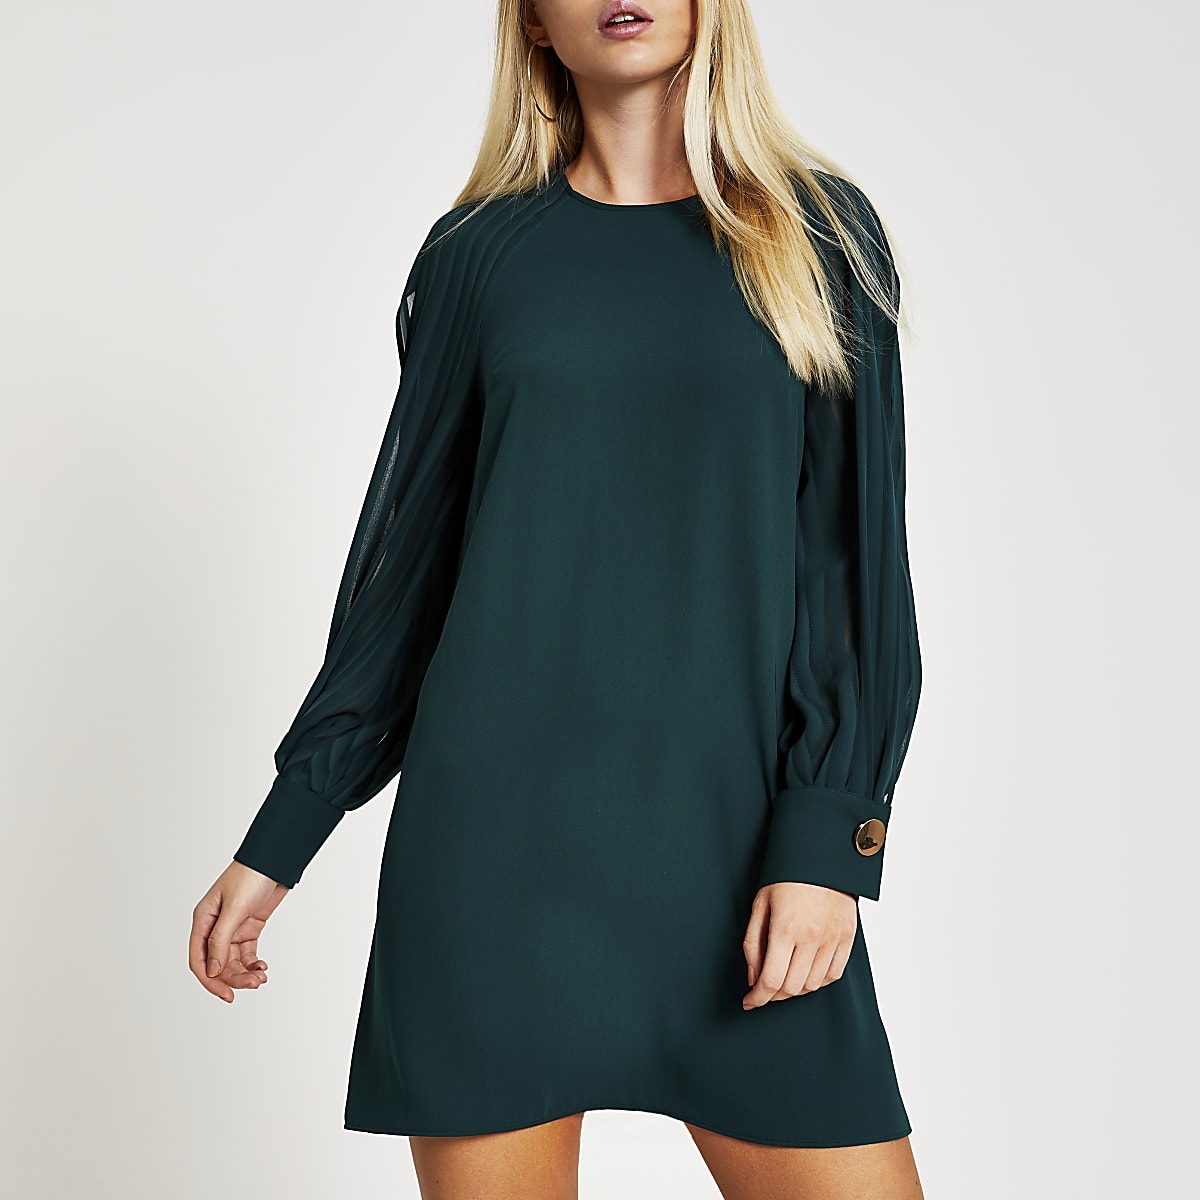 Green long pleated sheer sleeve swing dress